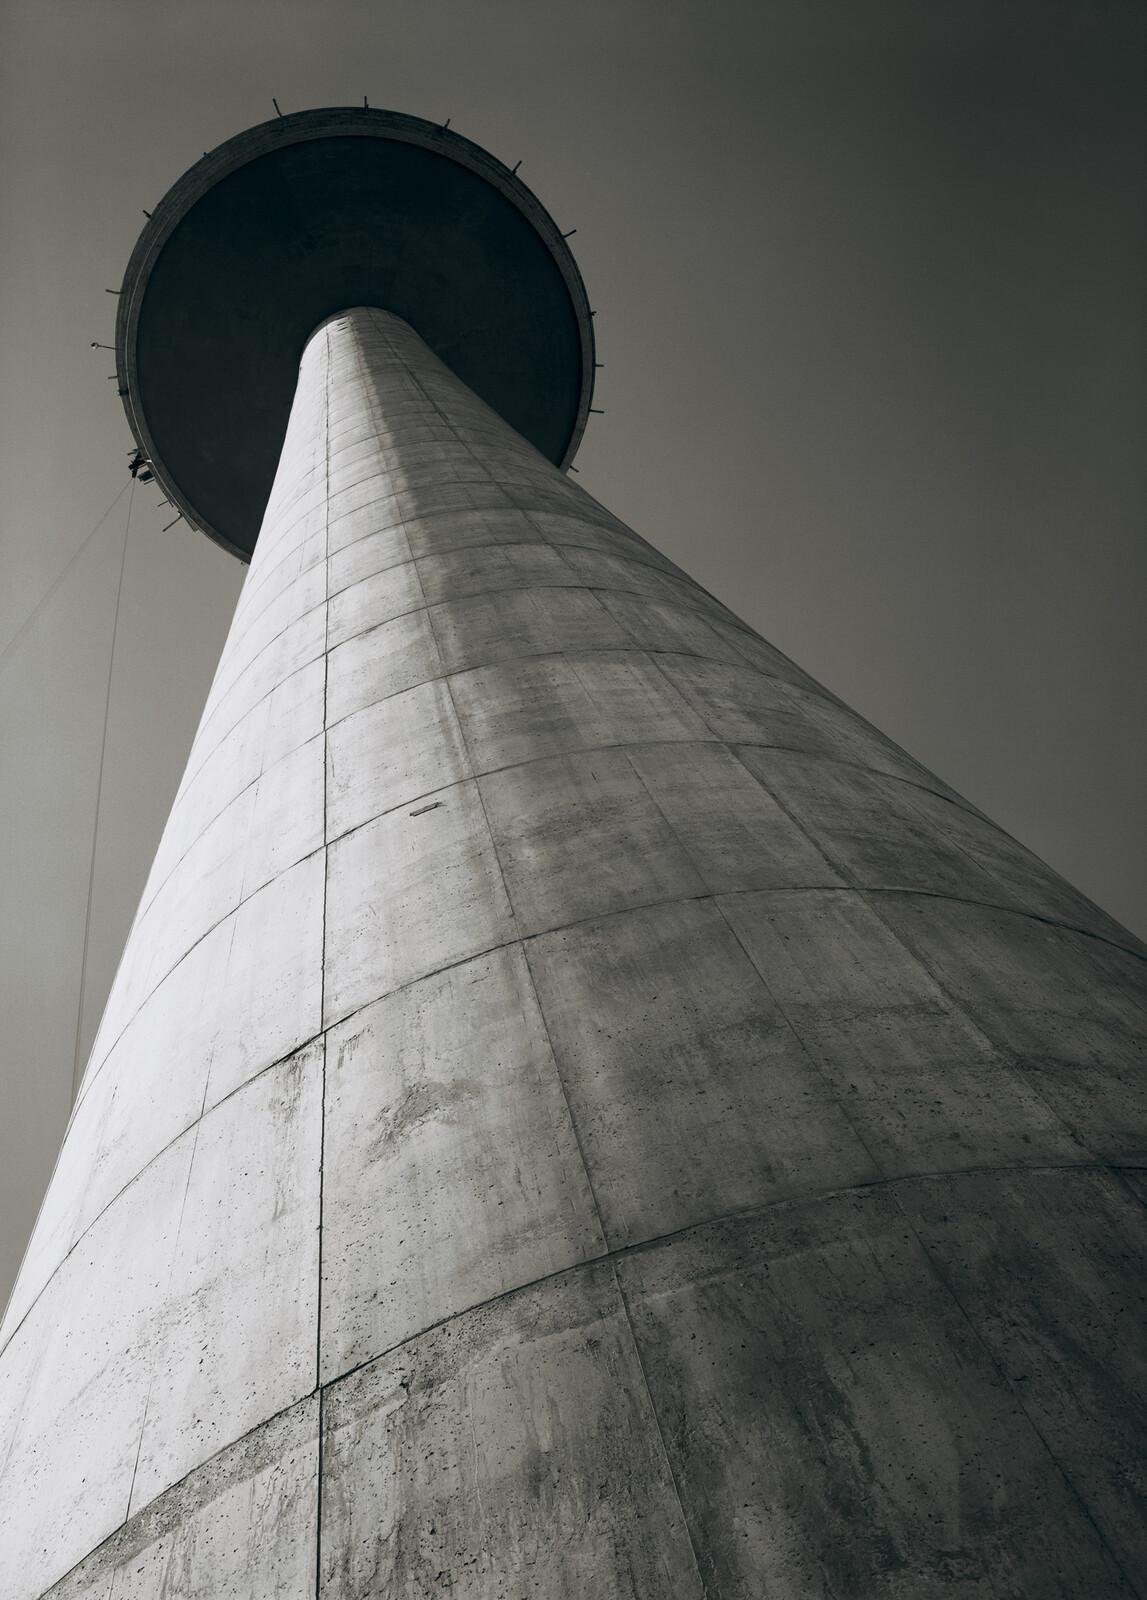 Fernsehturm Hannover - Heinrich Heidersberger